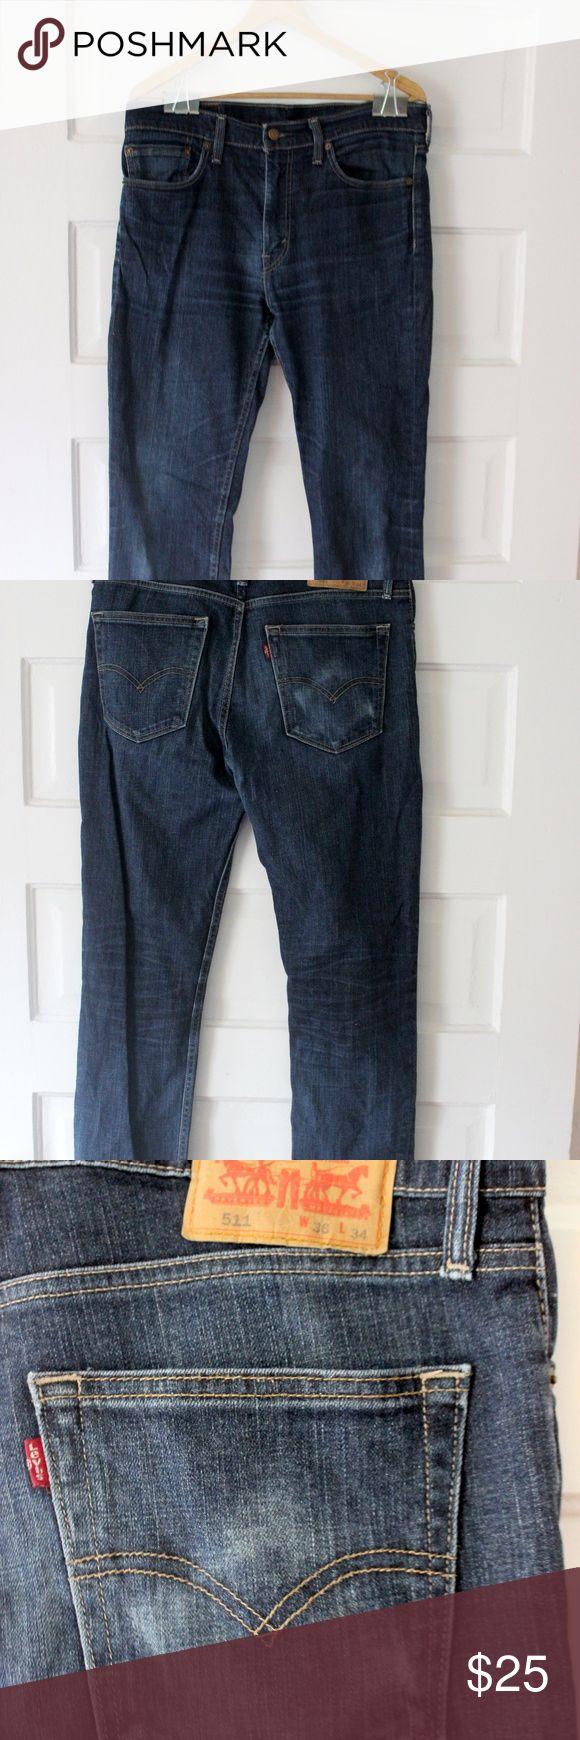 Selling this Men's Levi 511 Jeans 36x34 Dark Blue/Indigo on Poshmark! My username is: tonyabeeler. #shopmycloset #poshmark #fashion #shopping #style #forsale #Levi's #Other